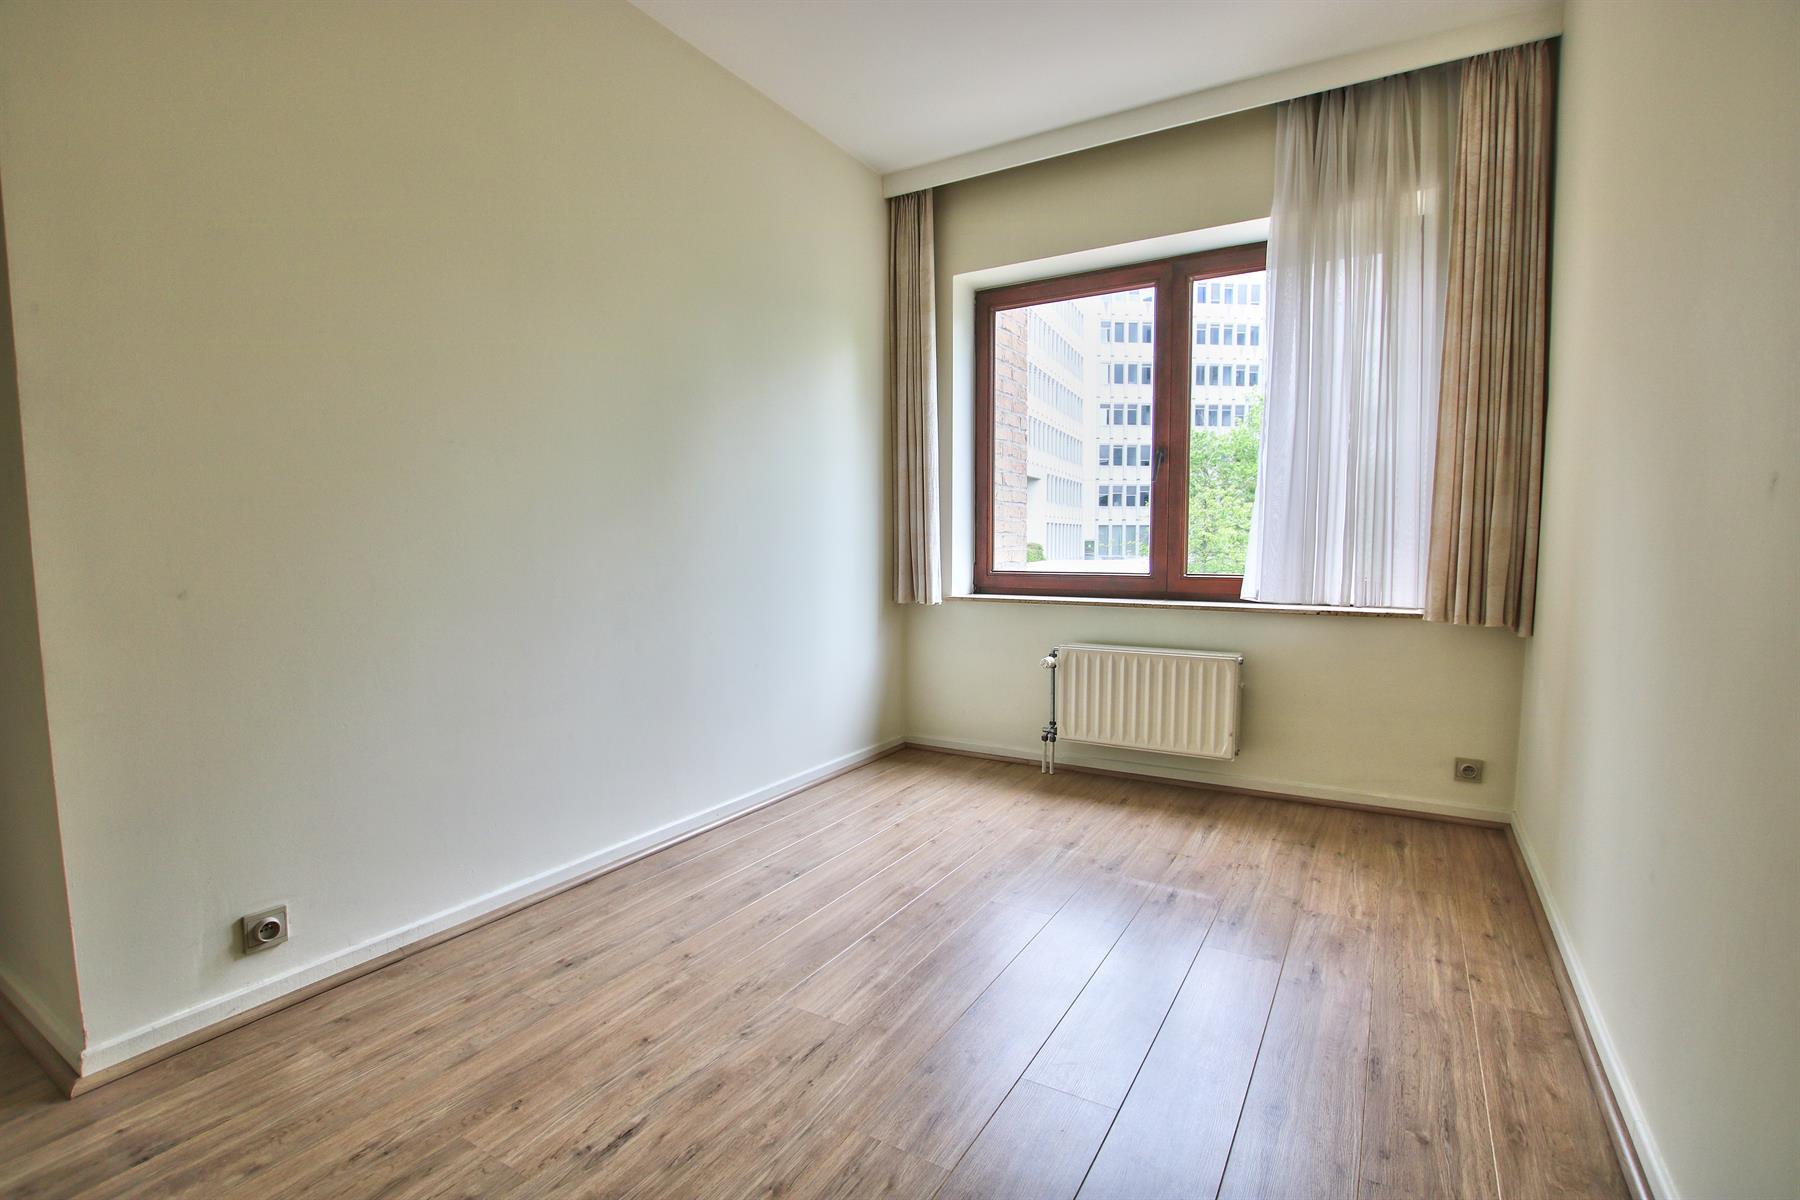 Appartement - Auderghem - #4517295-12